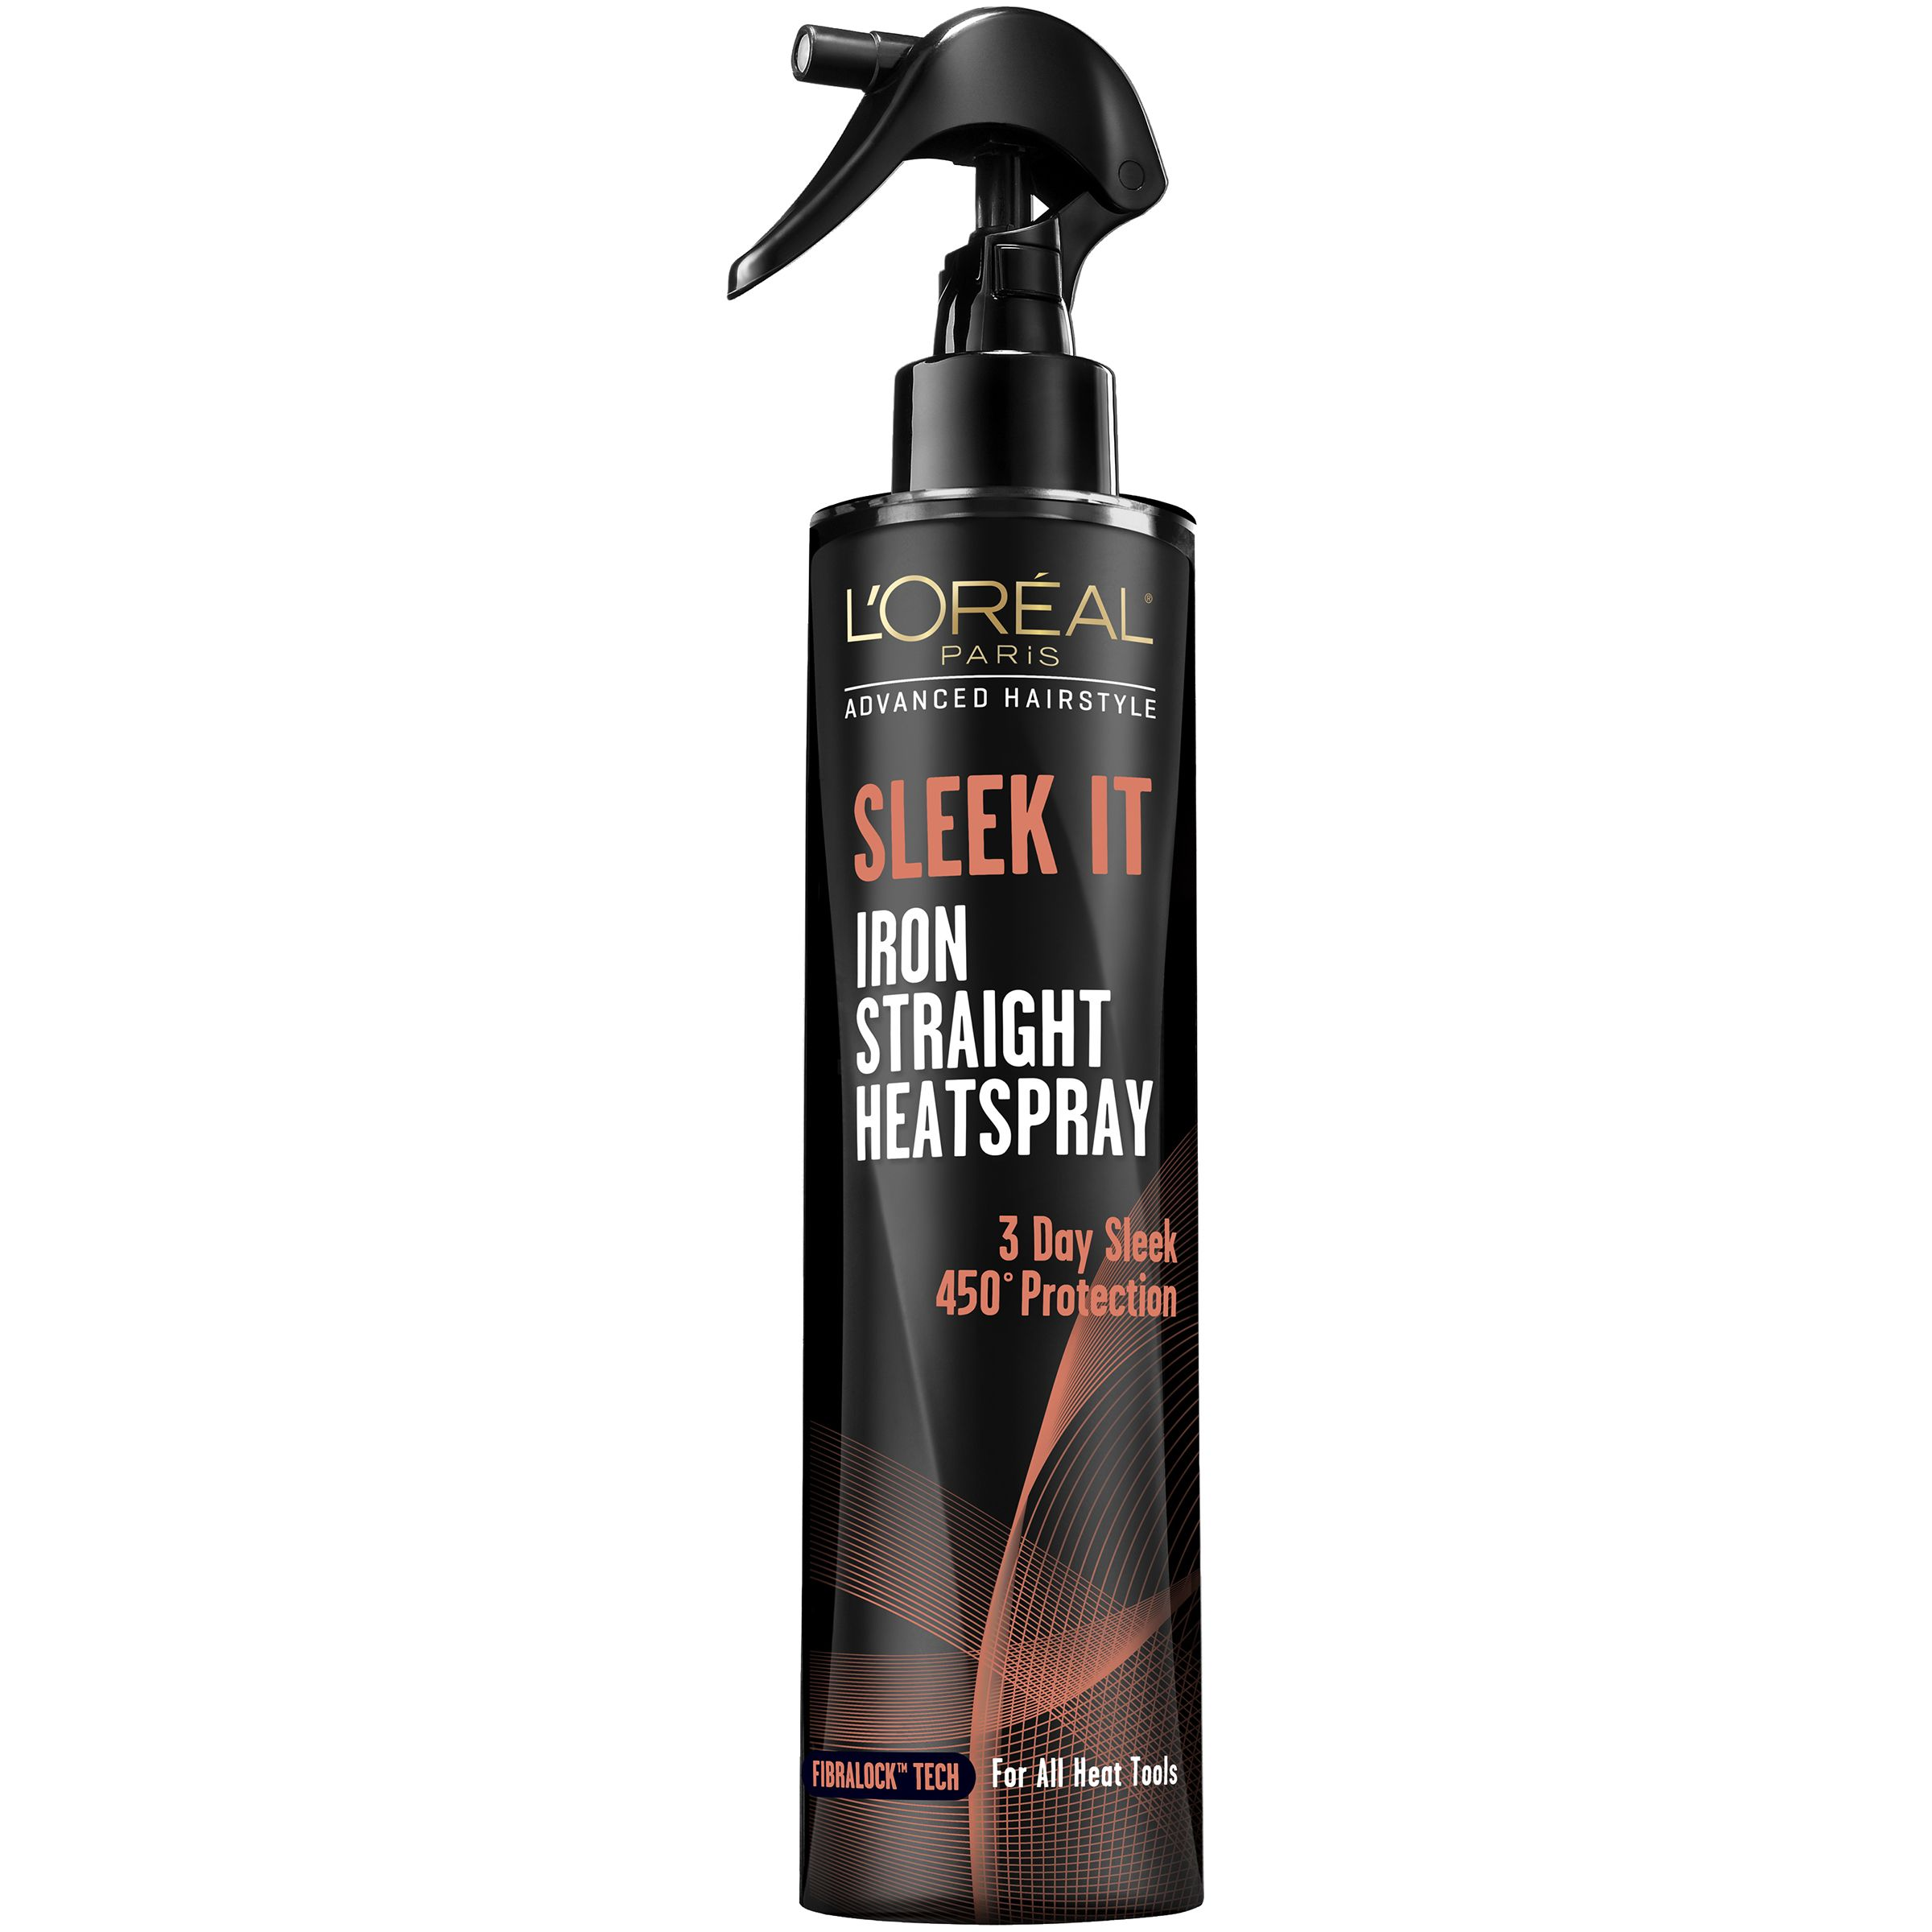 L Oreal Sleek It Iron Straight Heatspray Hair Styling Products Anti Frizz Products Heat Spray Loreal Paris